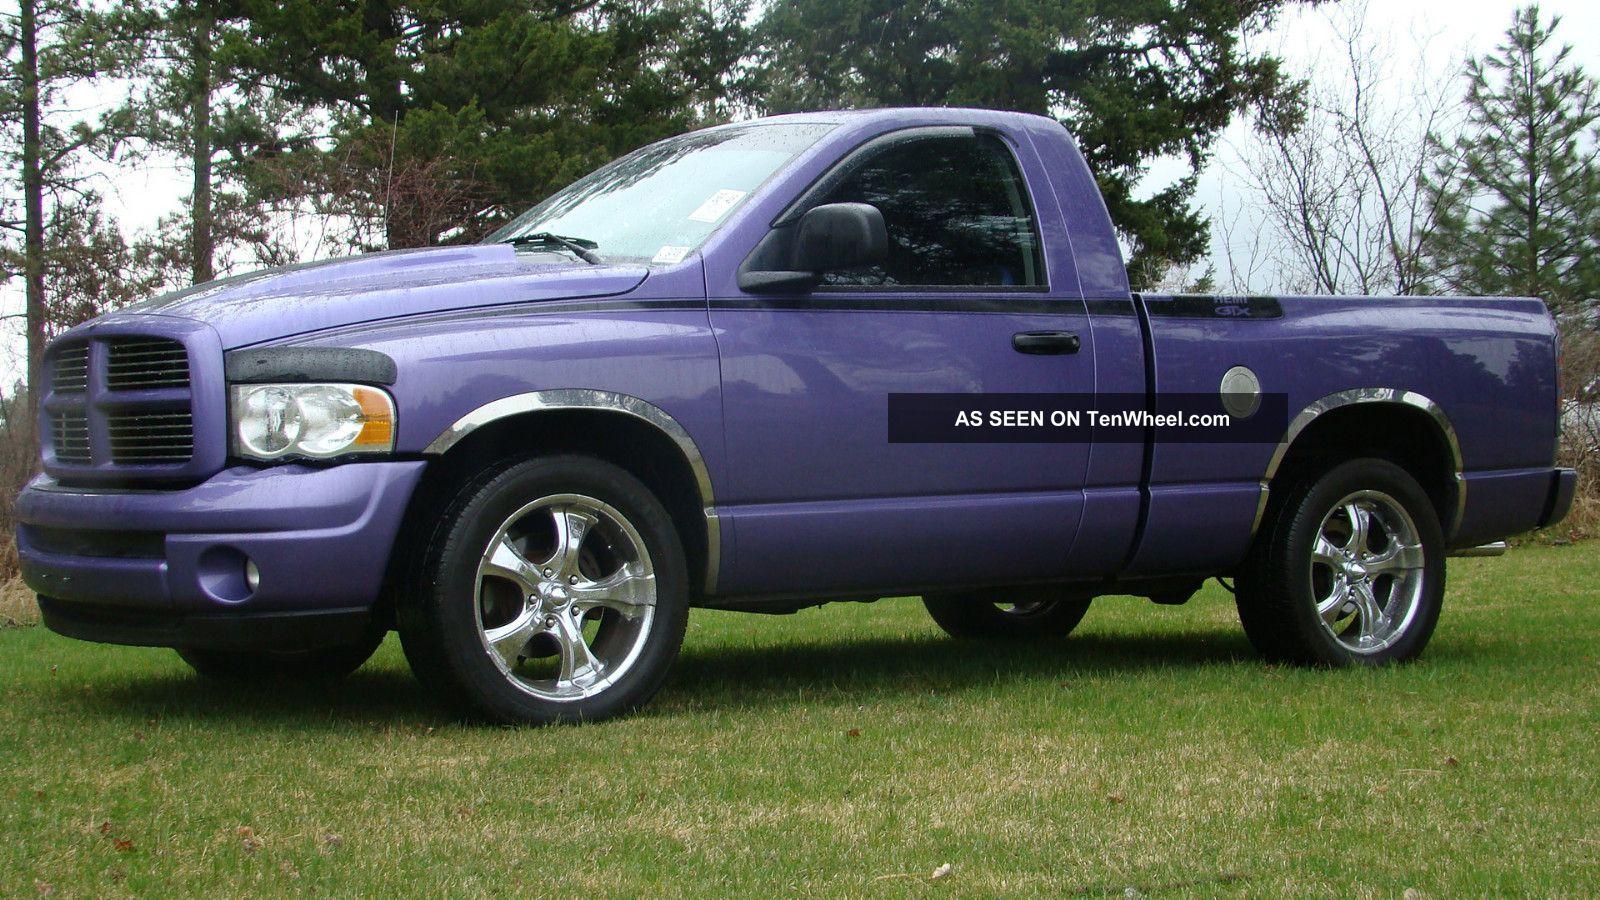 2004 Dodge Ram 1500 Slt Standard Cab Pickup 2 - Door 5.  7l Hemi Gtx Ram 1500 photo